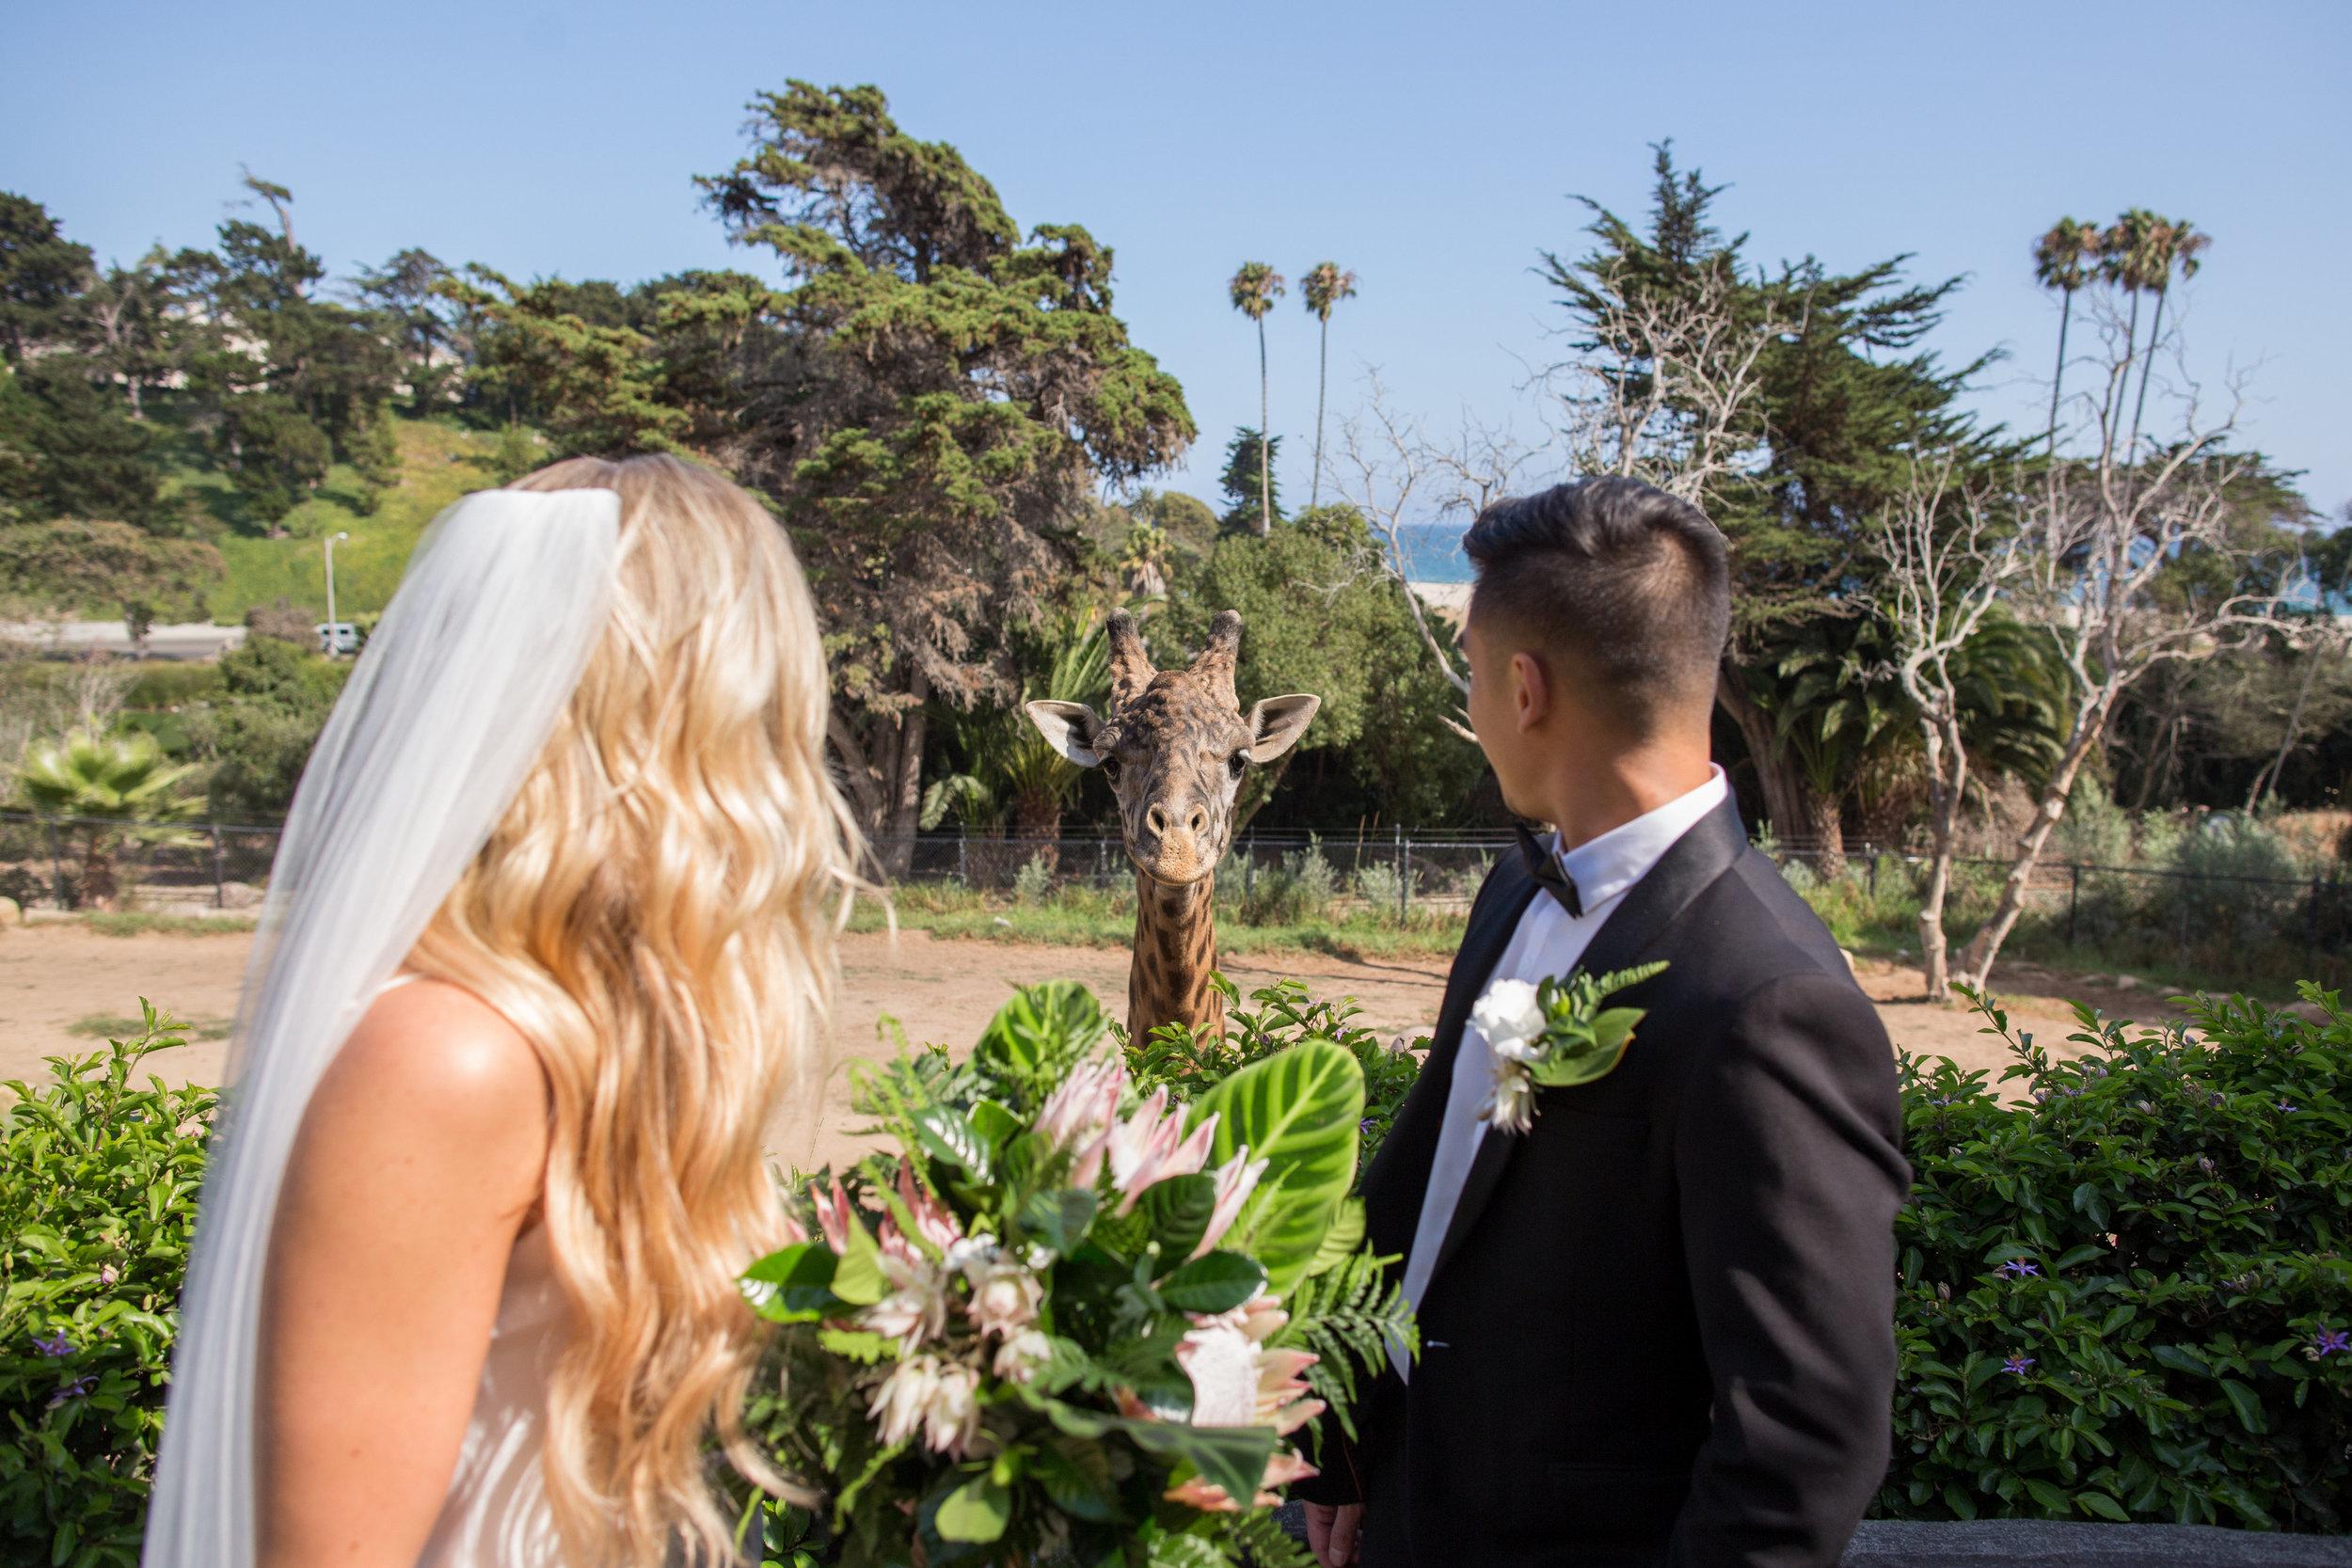 www.santabarbarawedding.com   Santa Barbara Zoo   Wonder Tribe   Events by Rincon   Bride and Groom and Giraffe